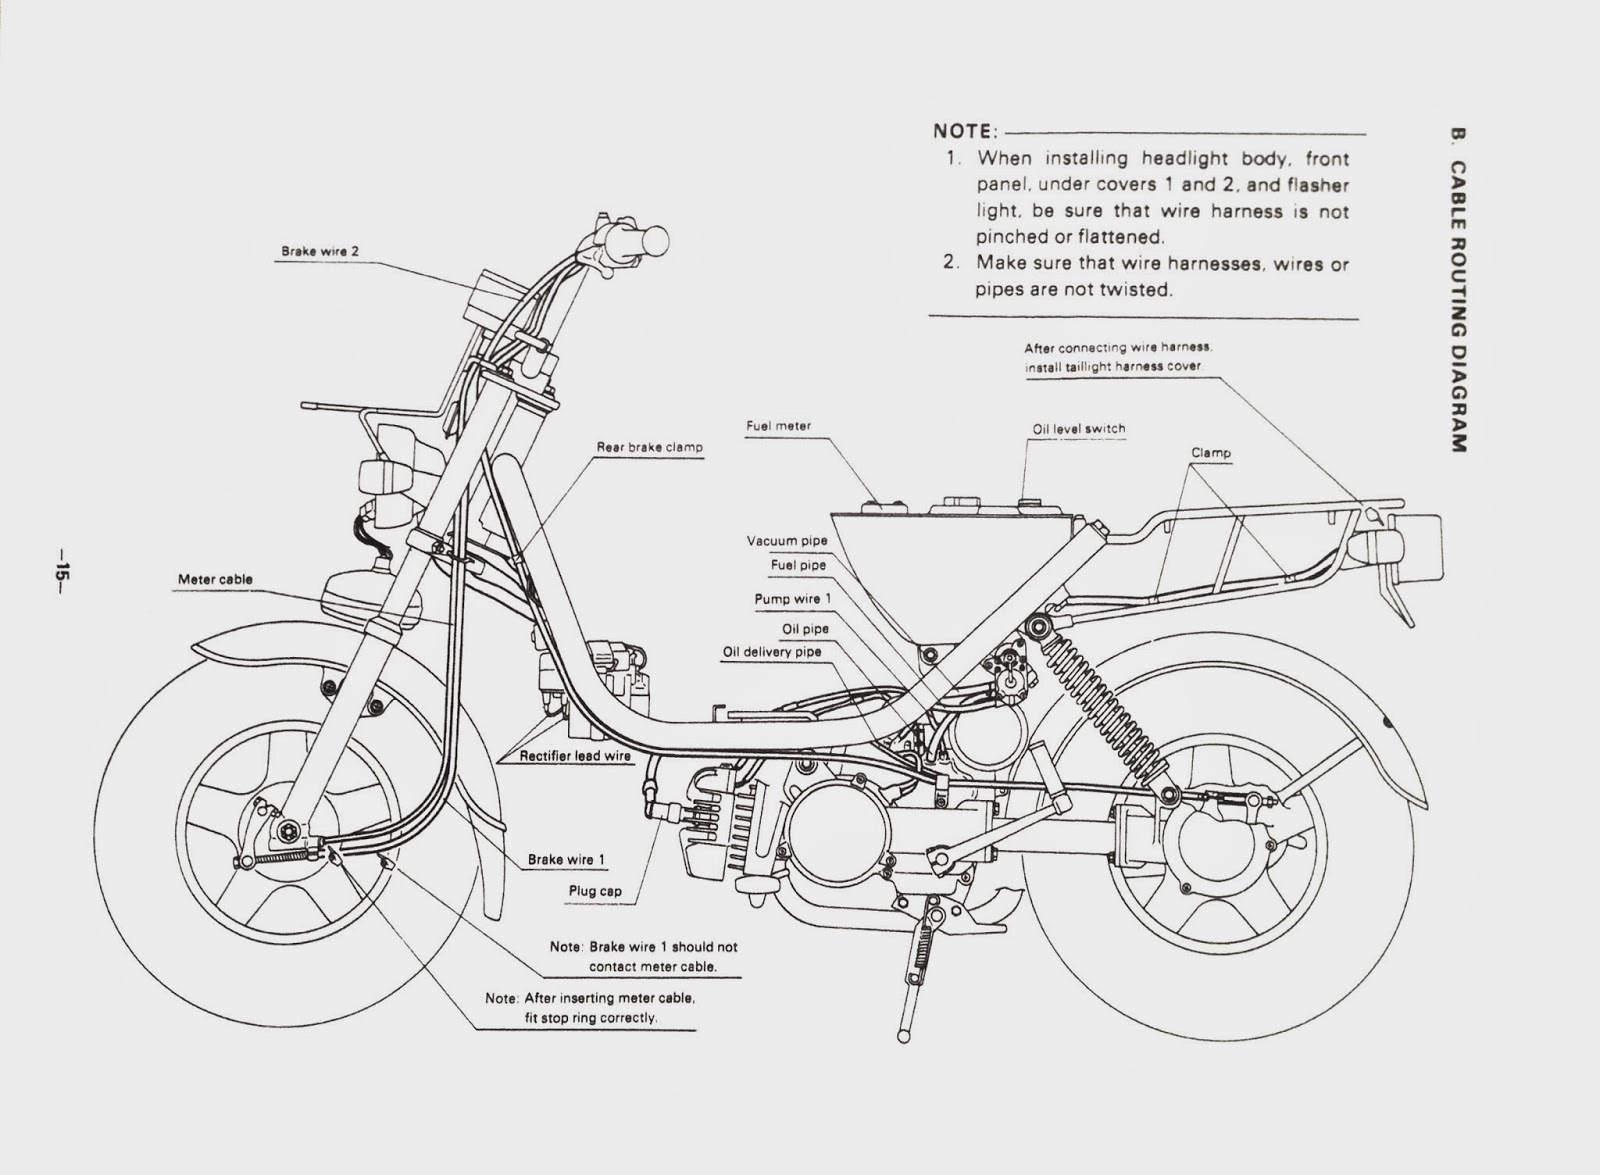 Yamaha LC50: Yamaha LC50 Service Manual on